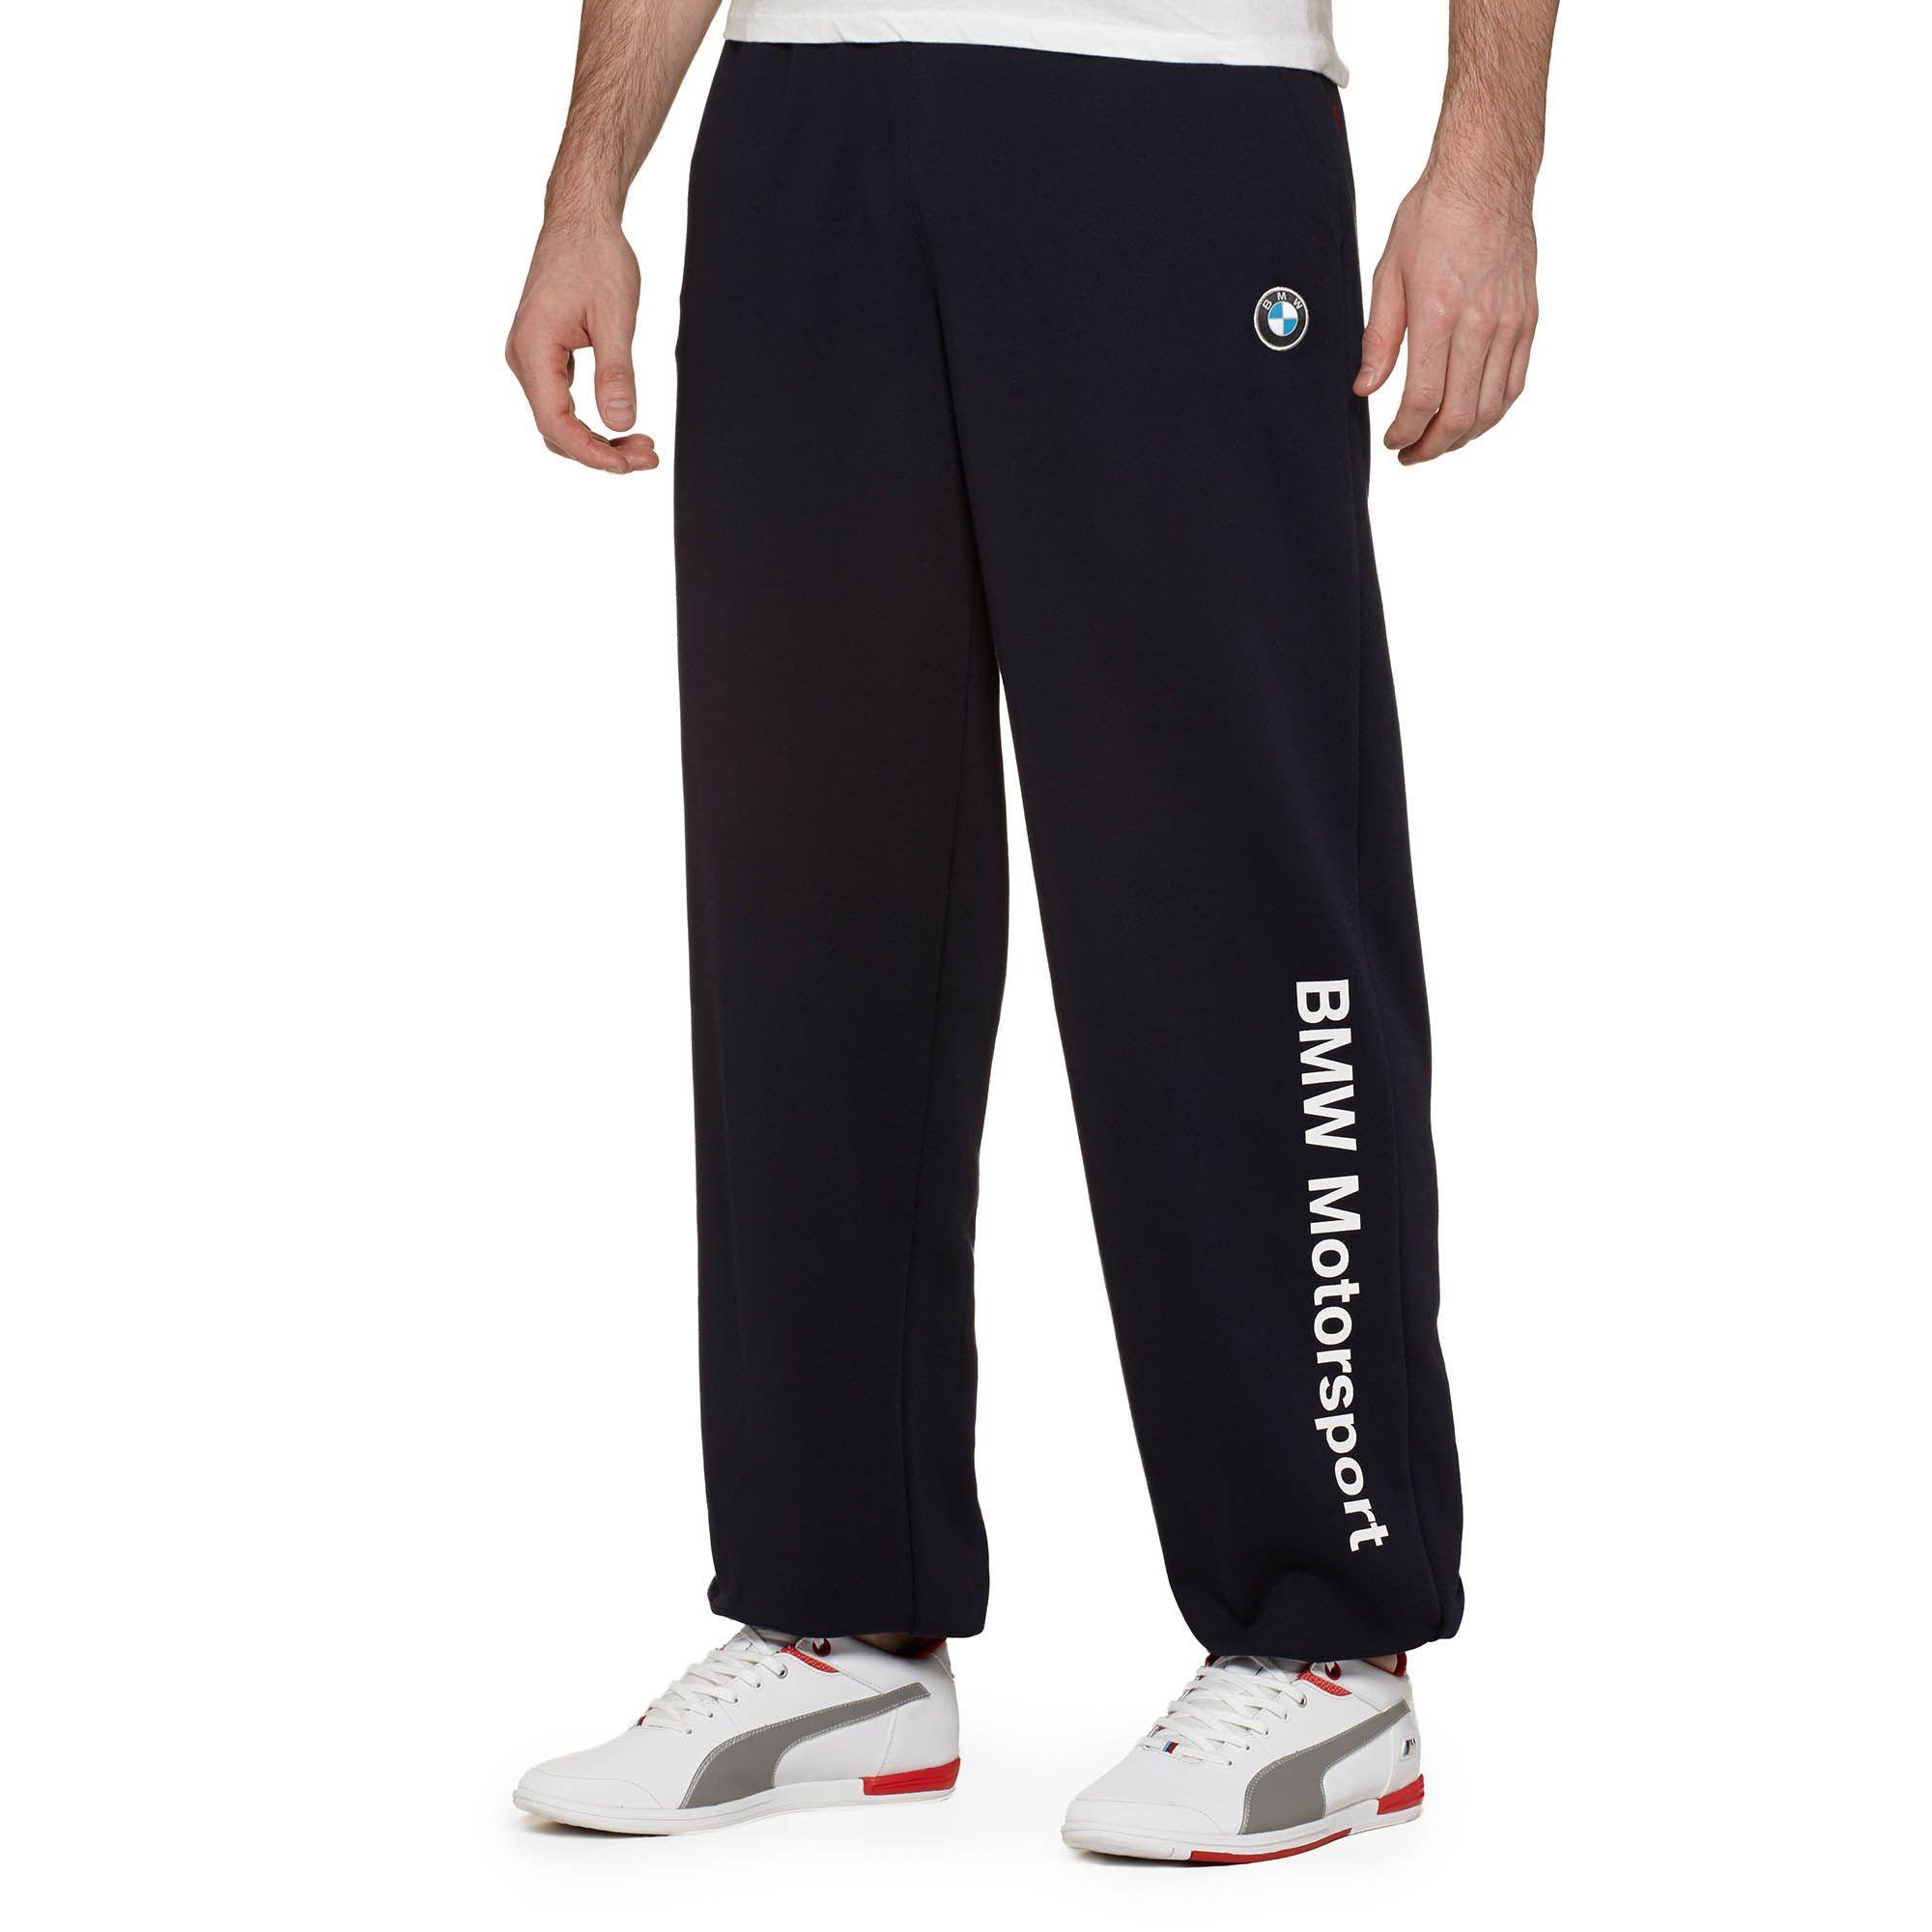 puma jogginghose bmw